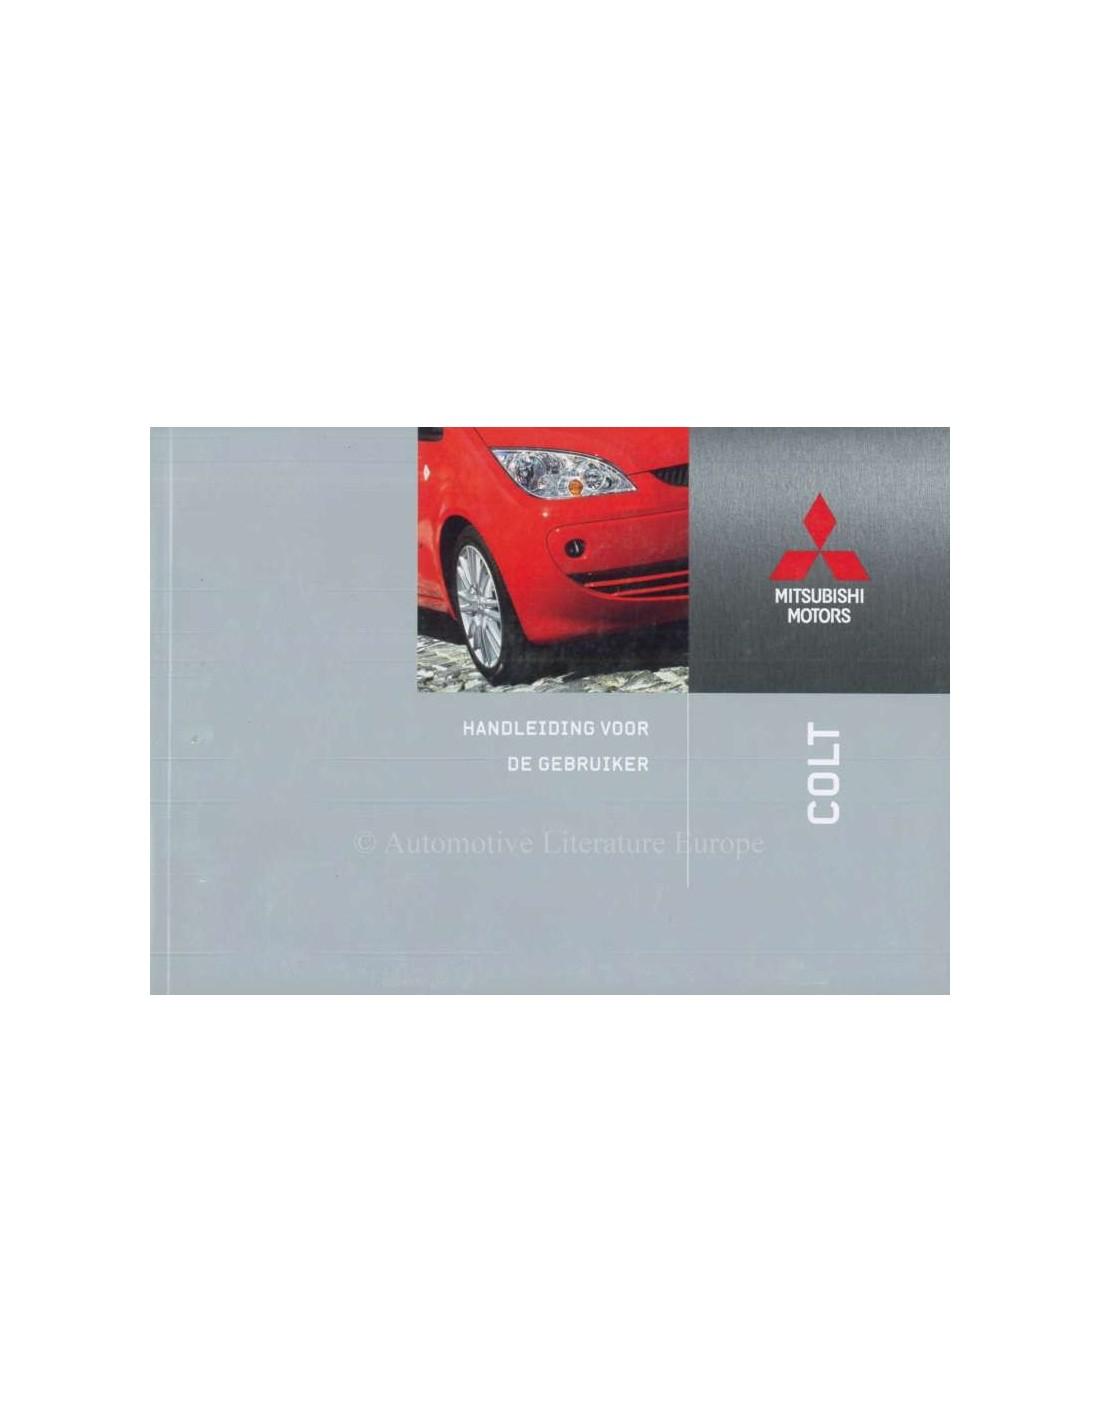 Wrg-2785] colt 2008 service manual download | 2019 ebook library.